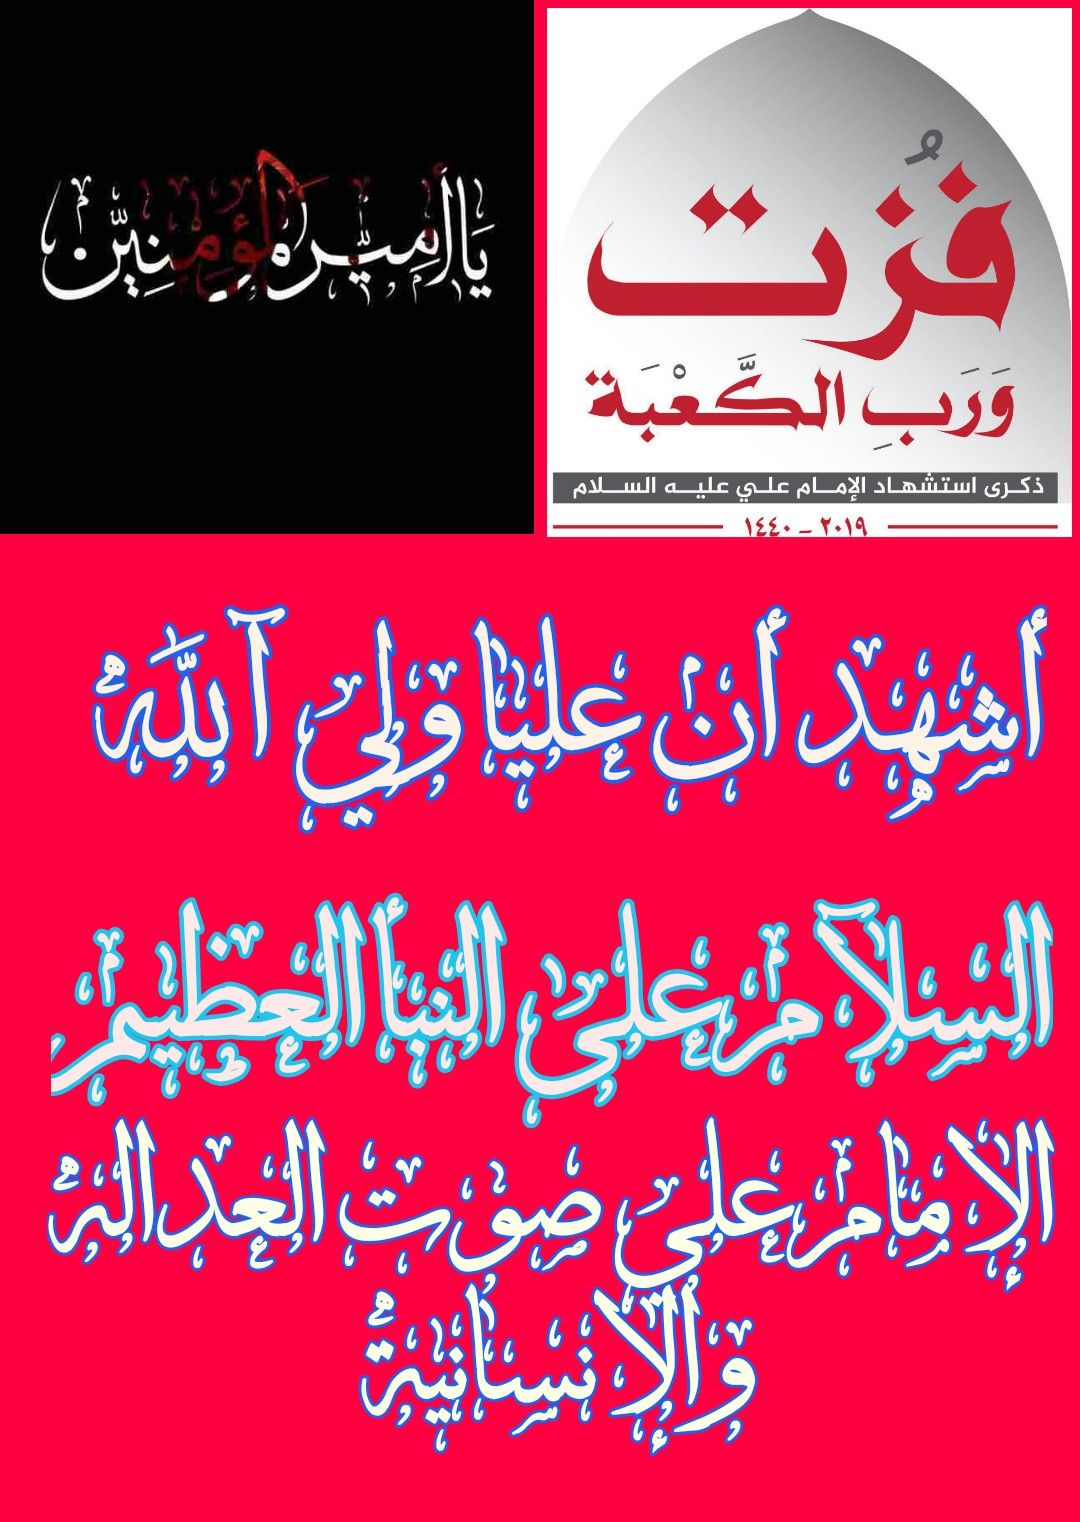 Pin By Rodaina Wehbe On Prophet Calligraphy Arabic Calligraphy Arabic